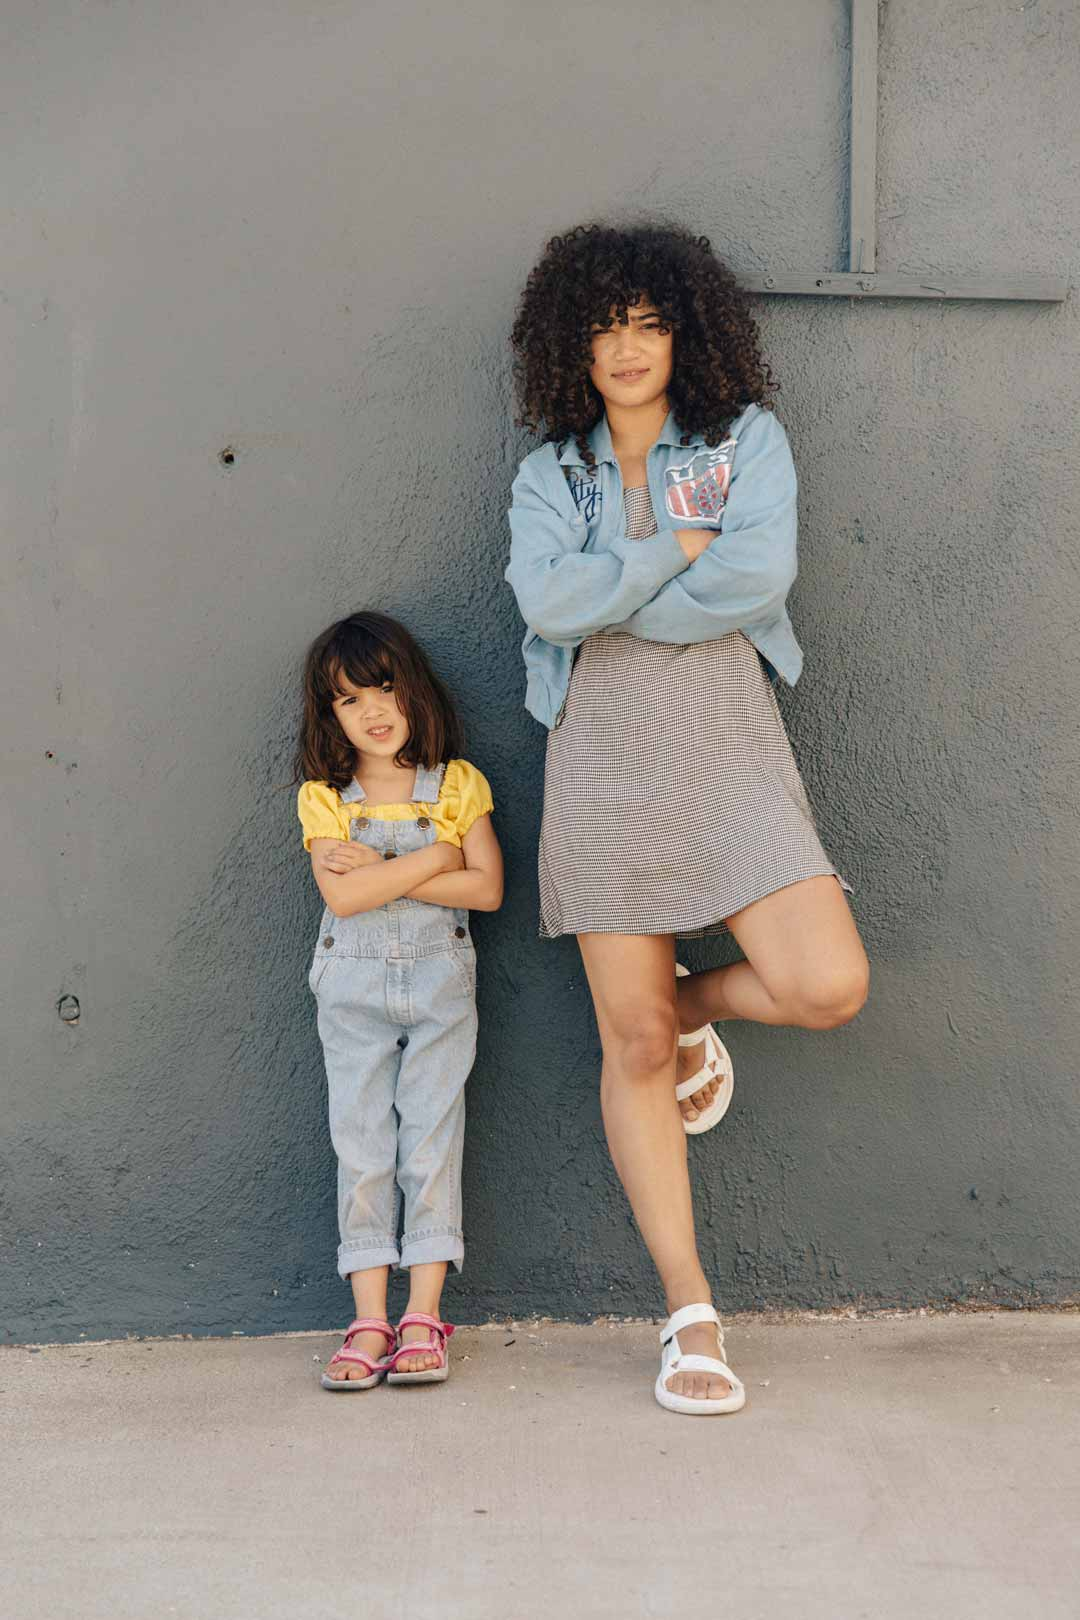 Grant-Puckett-Teva-Mothers-Day-27